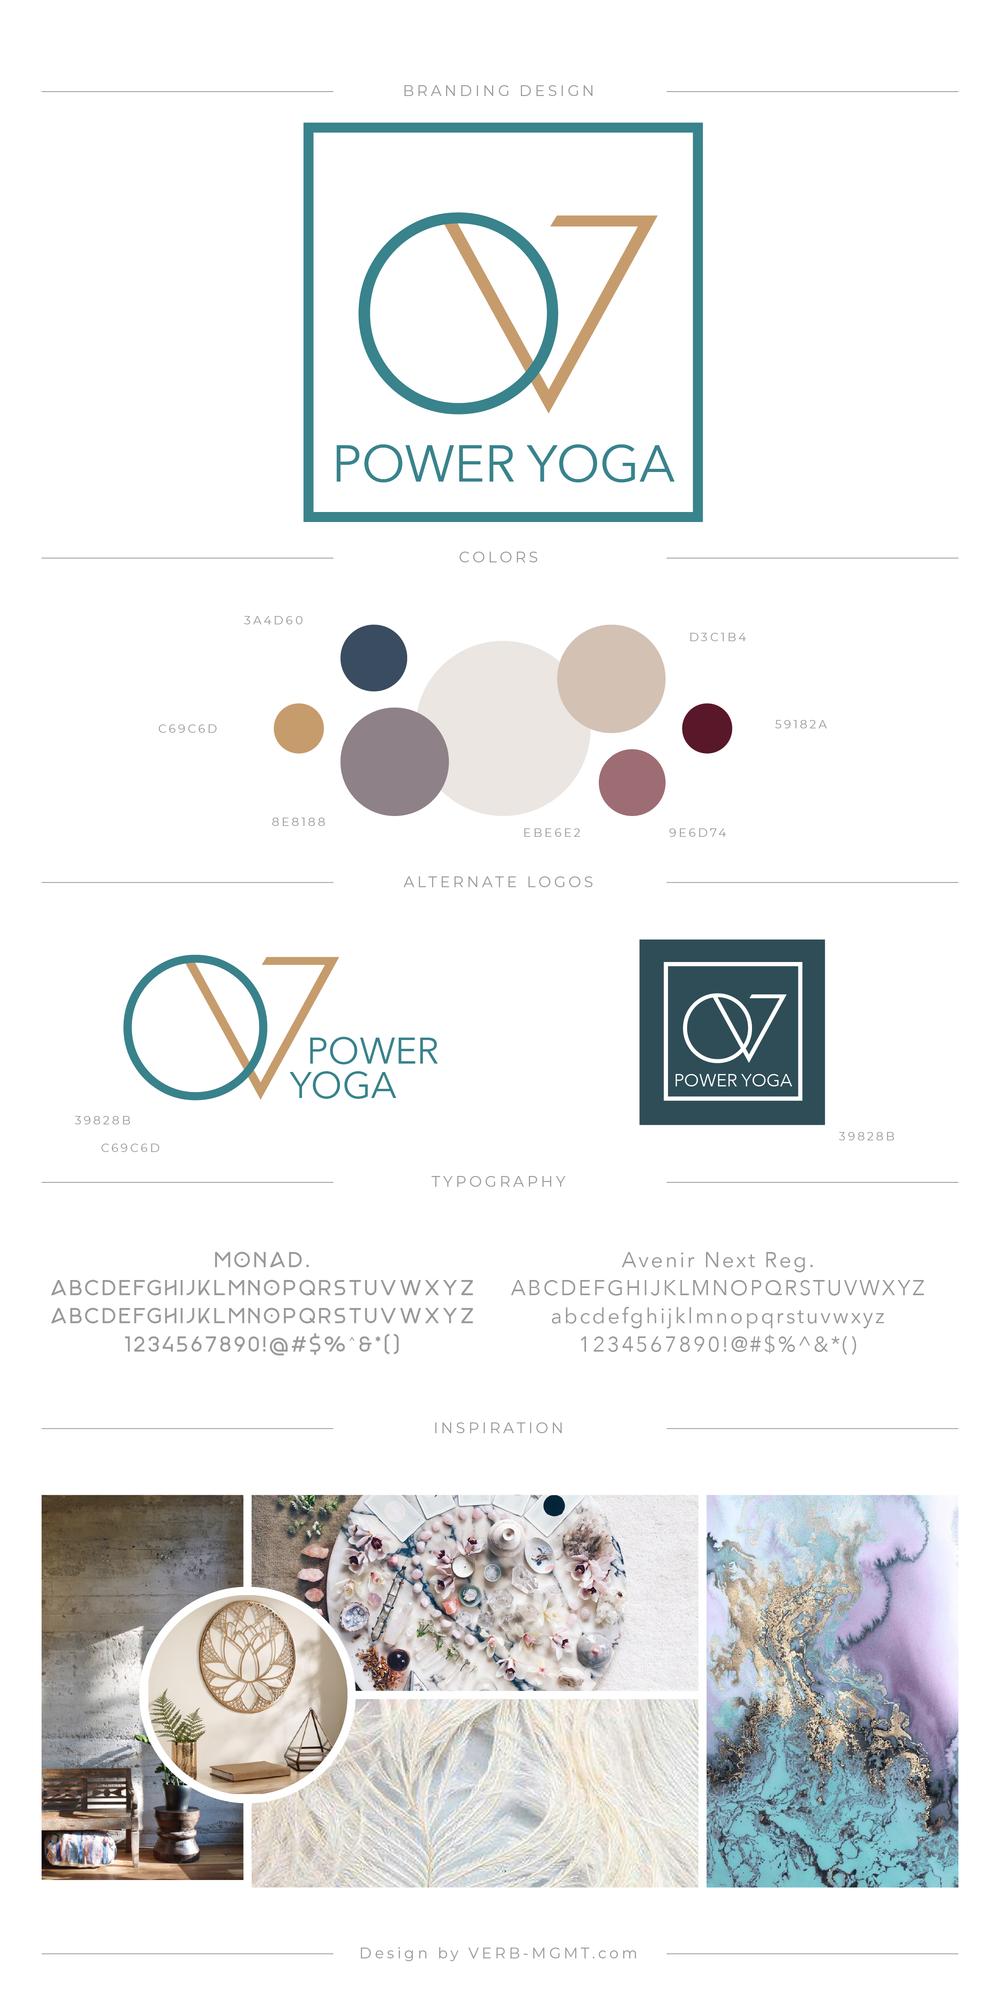 mood-board-brand-branding-yoga-lifestyle-wellness-health-fitness-design-verb-mgmt-management